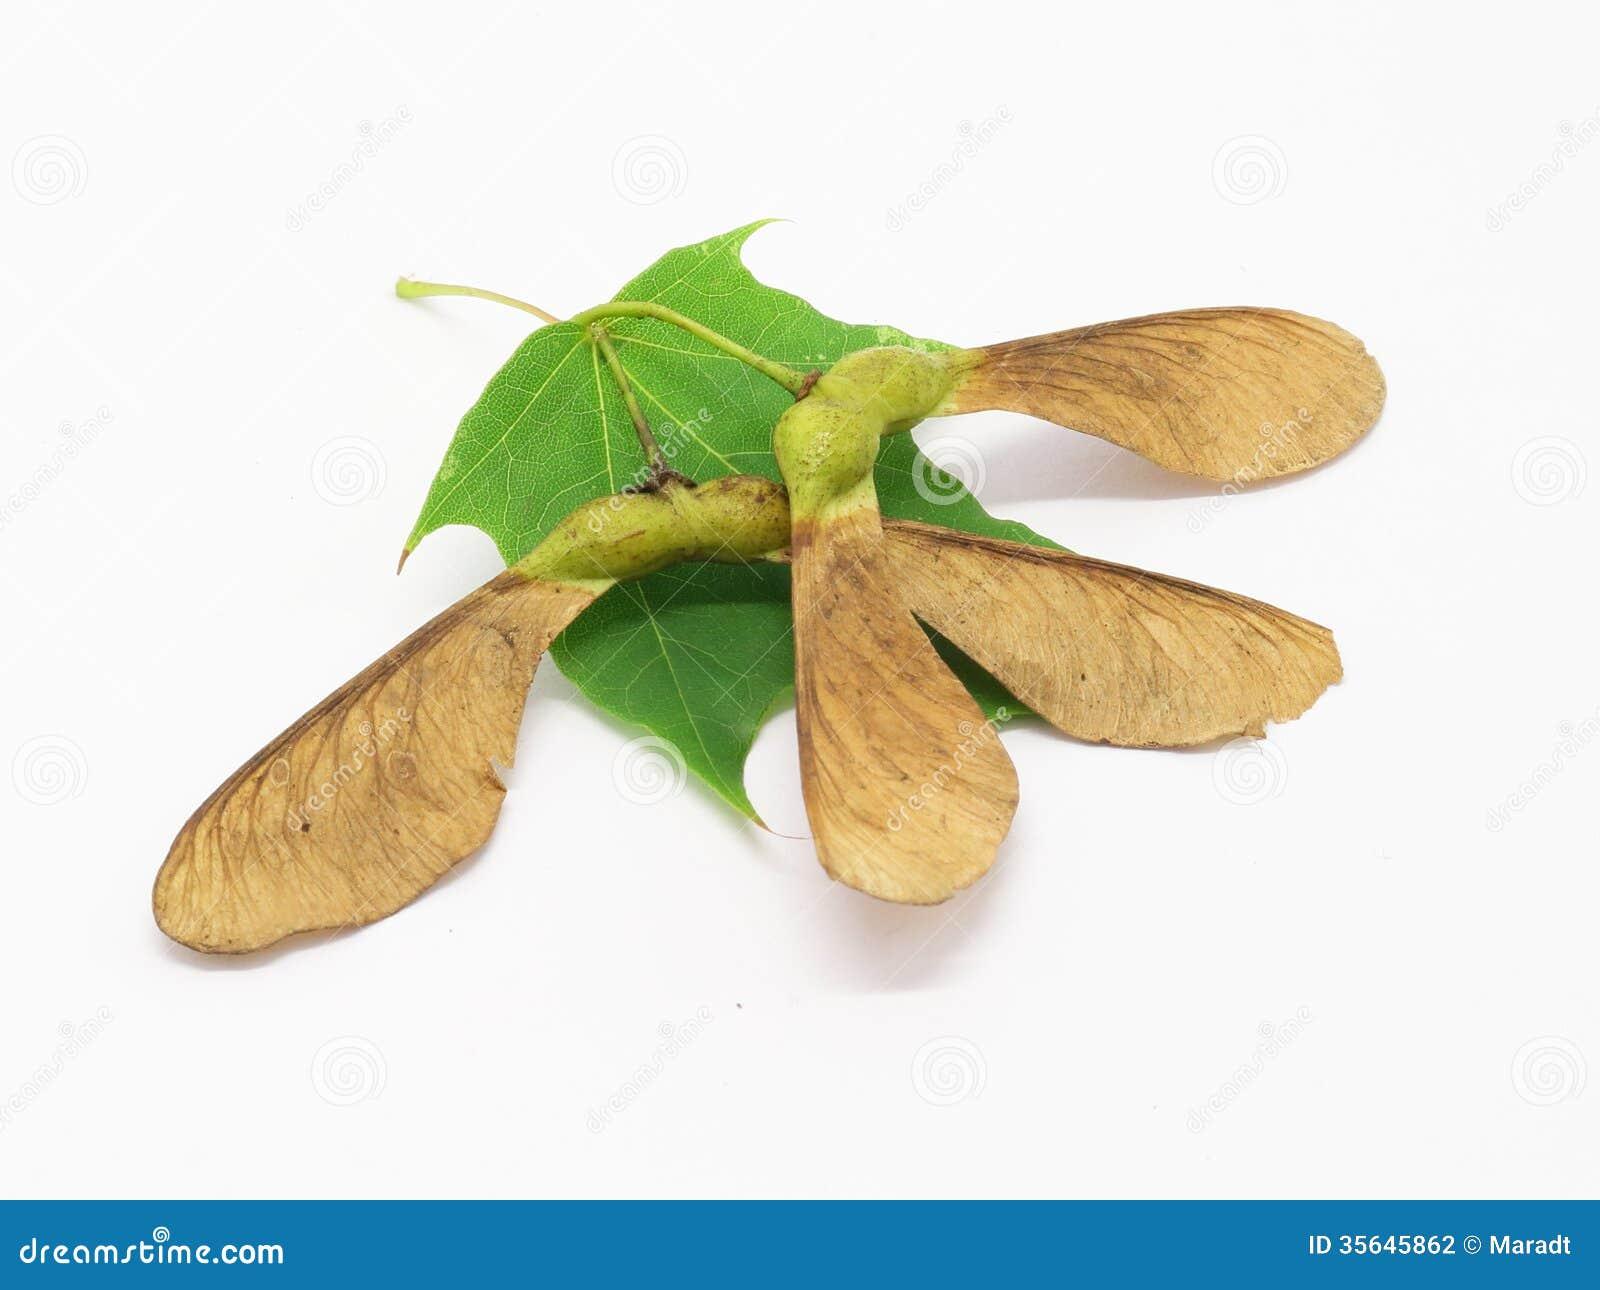 Maple seeds and leaf